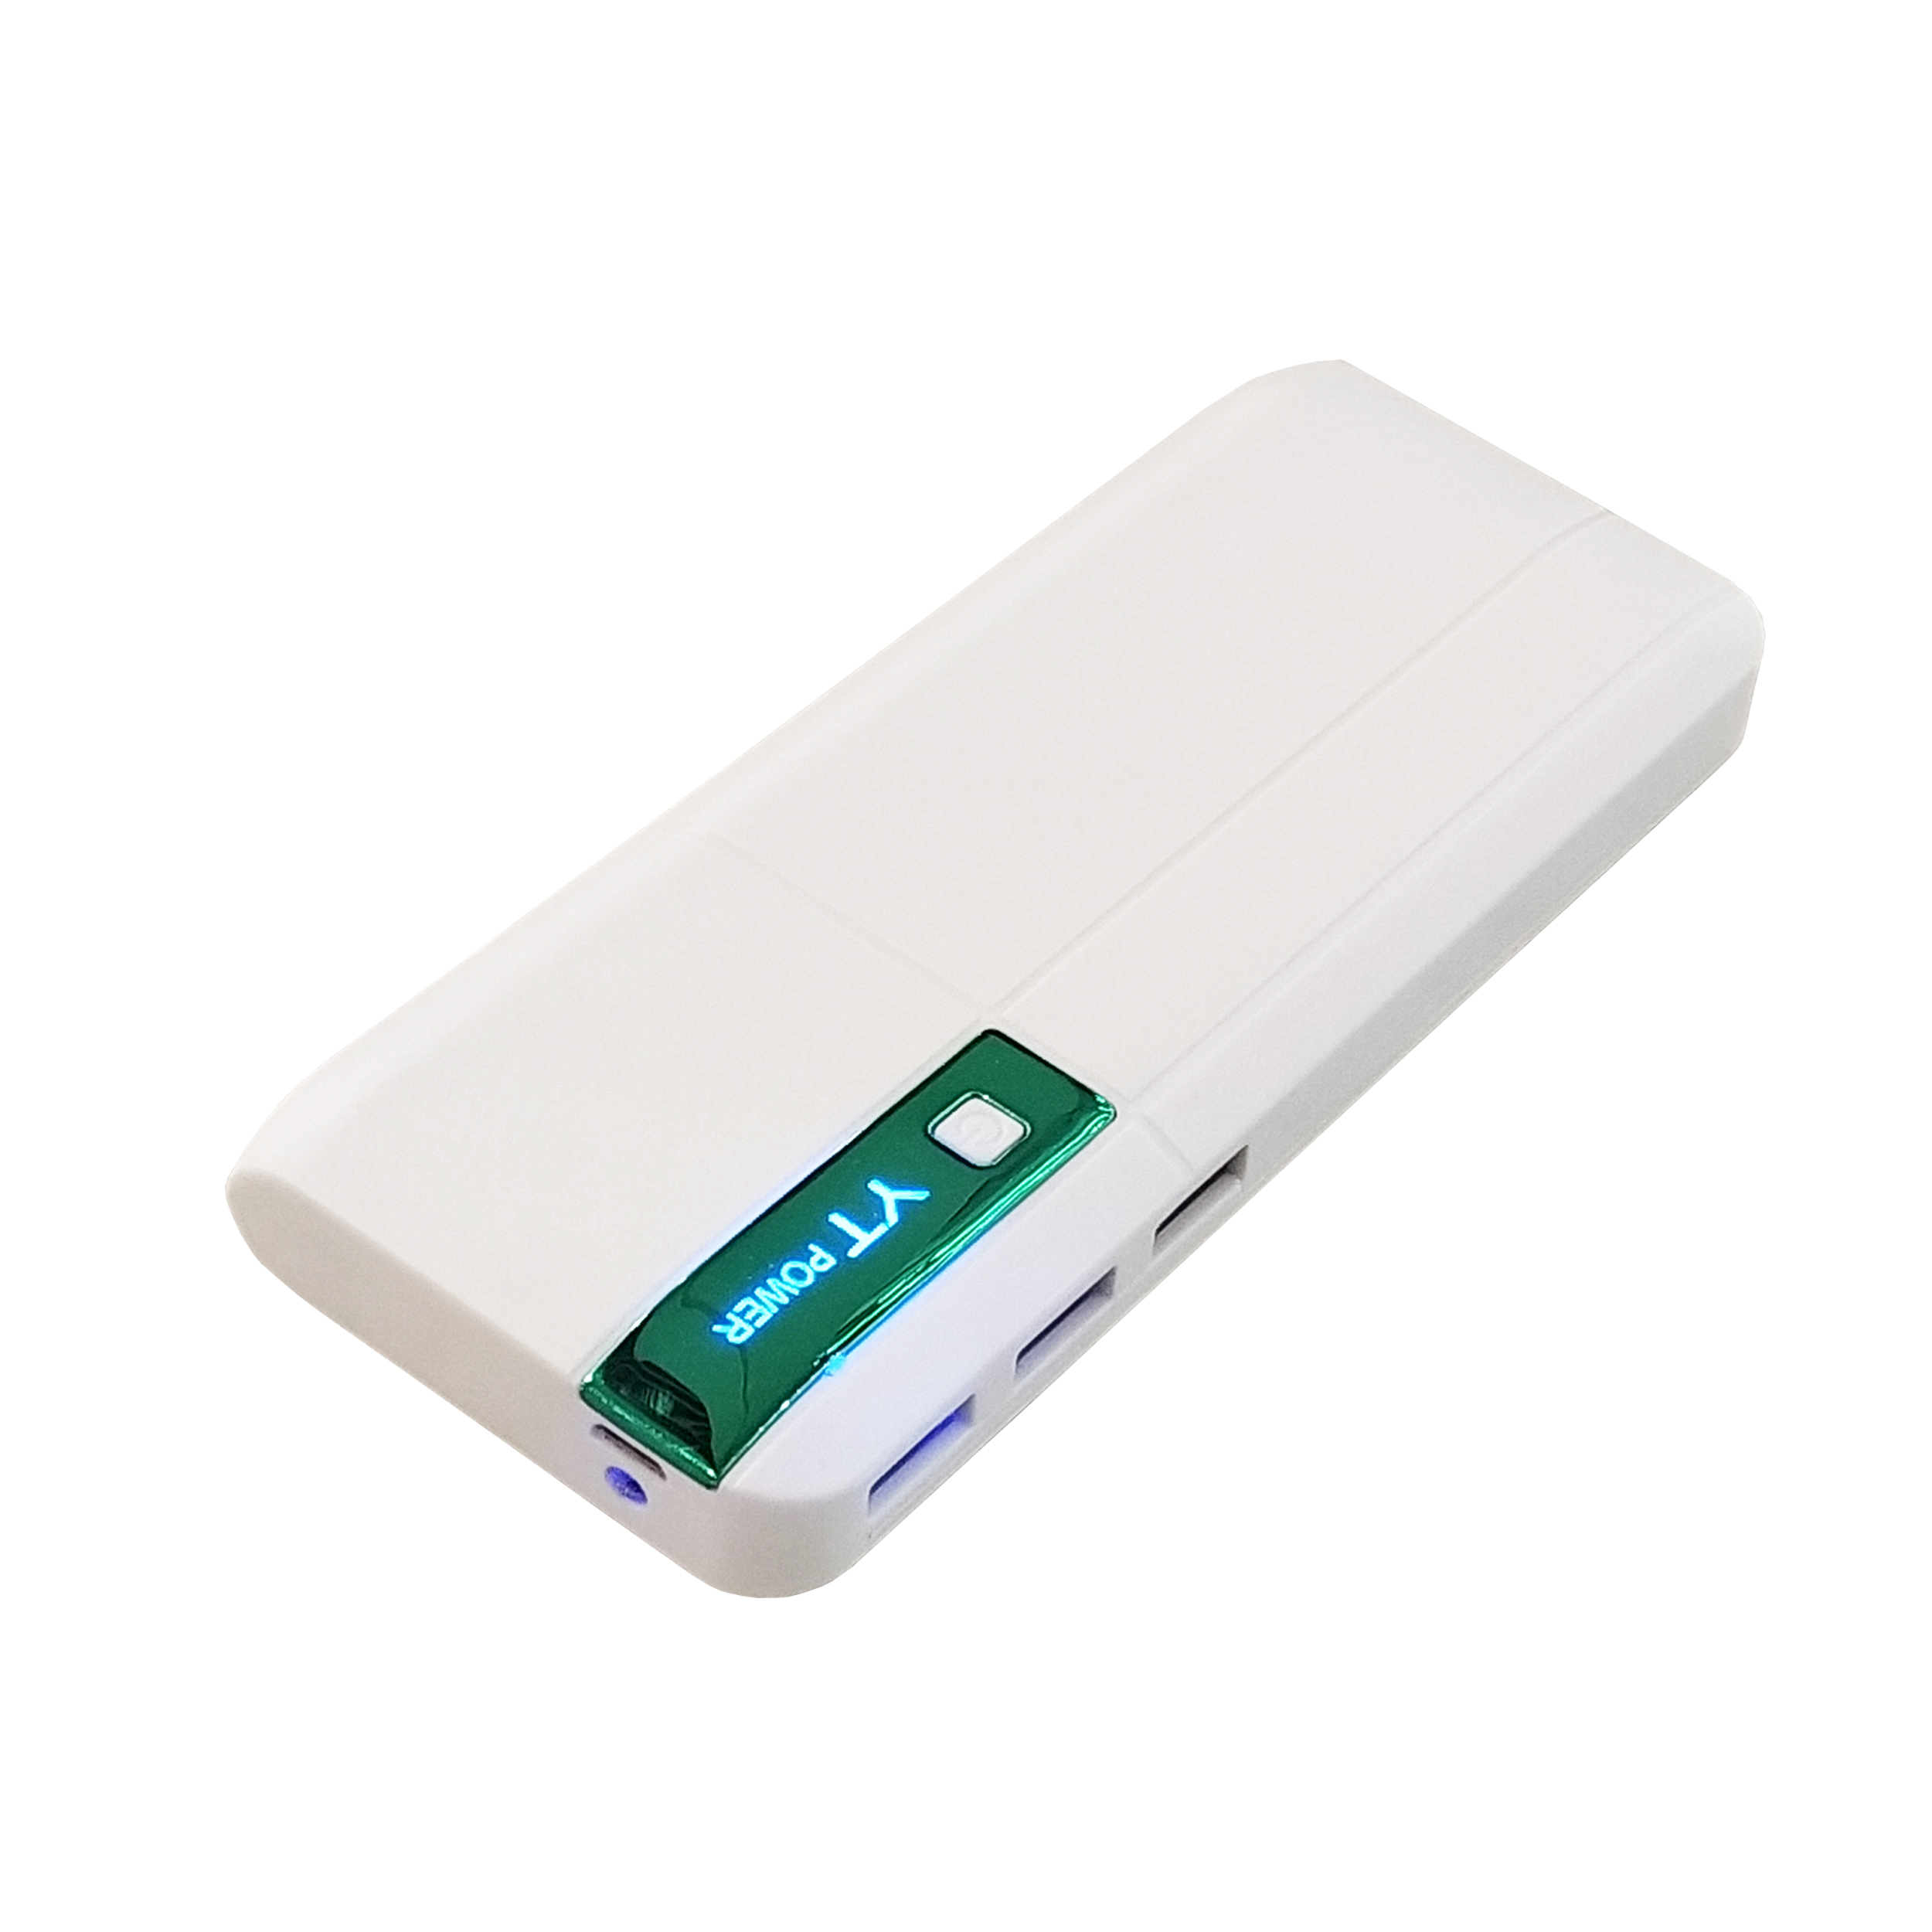 شارژر همراه وای تی پاور مدل Cls-GS-01 ظرفیت ۲۰۰۰۰ میلی آمپر ساعت